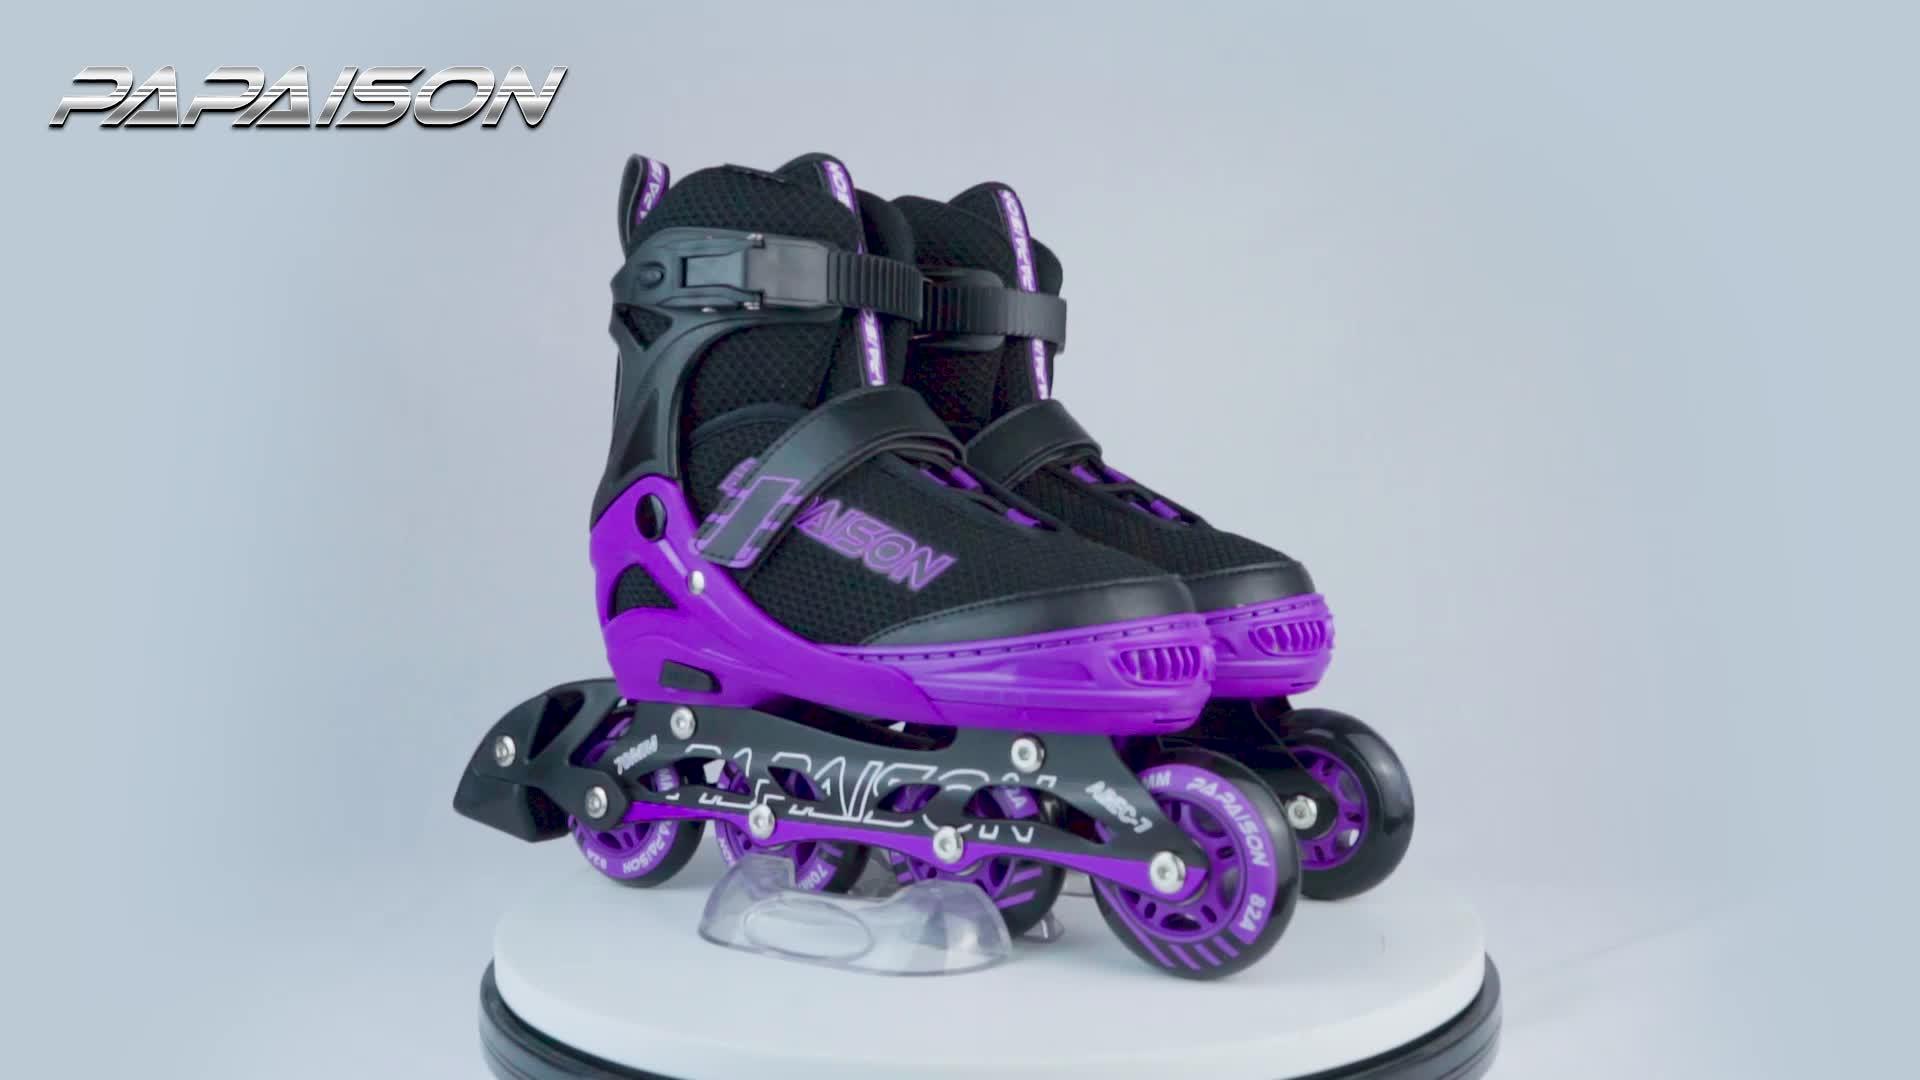 PAPAISON hot vender 4 roda leve PU X-grande tamanho adultos patins inline velocidade patins